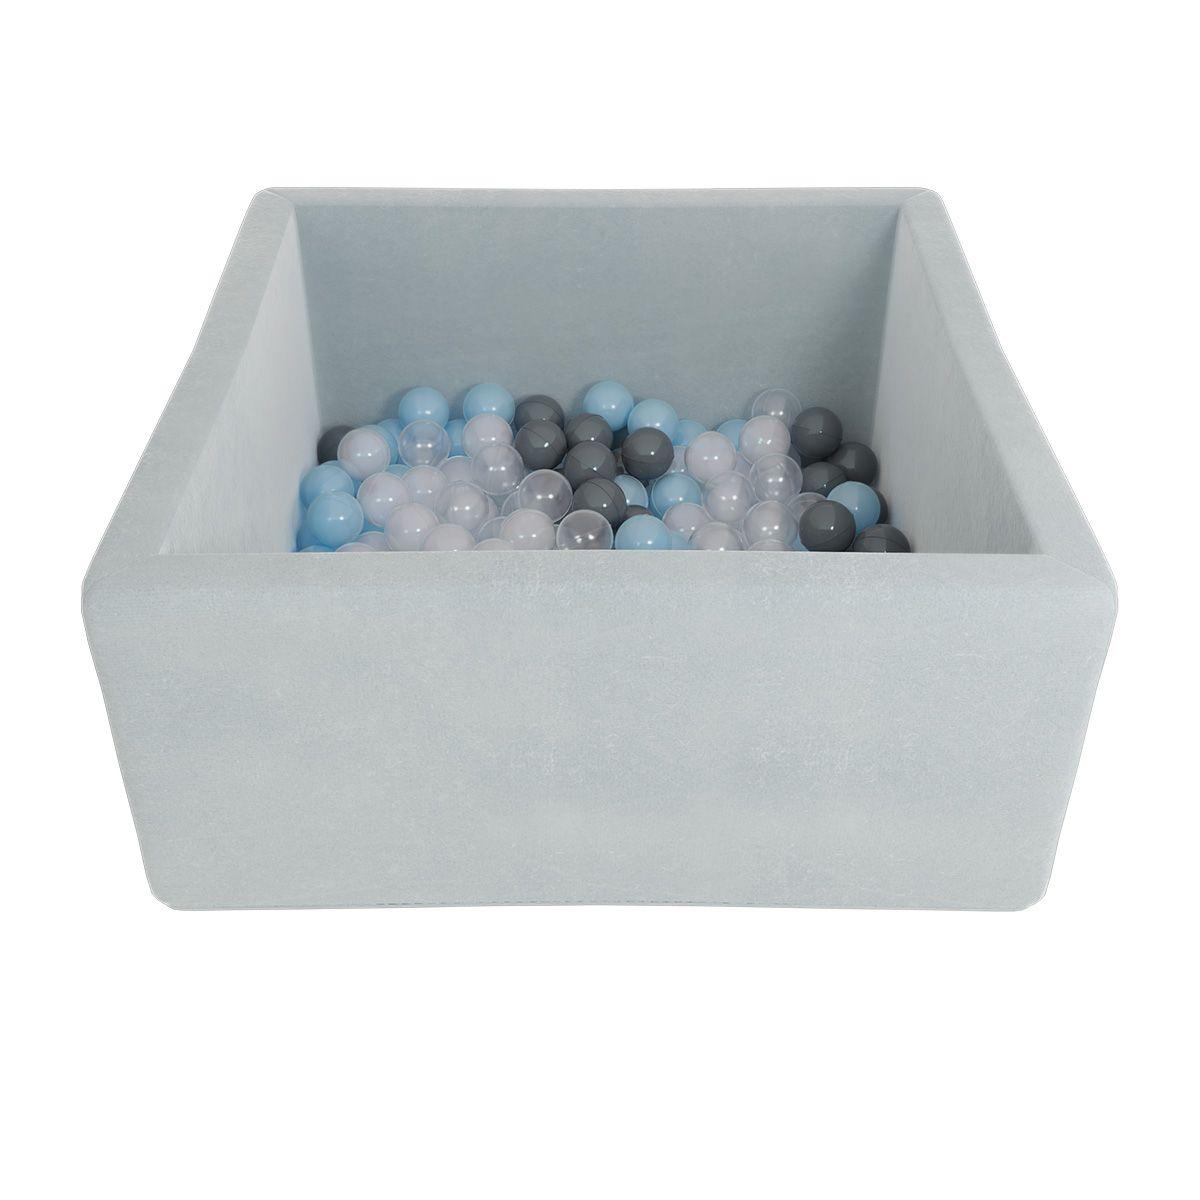 "Romana / Dry pool ""Airpool BOX"", gray"